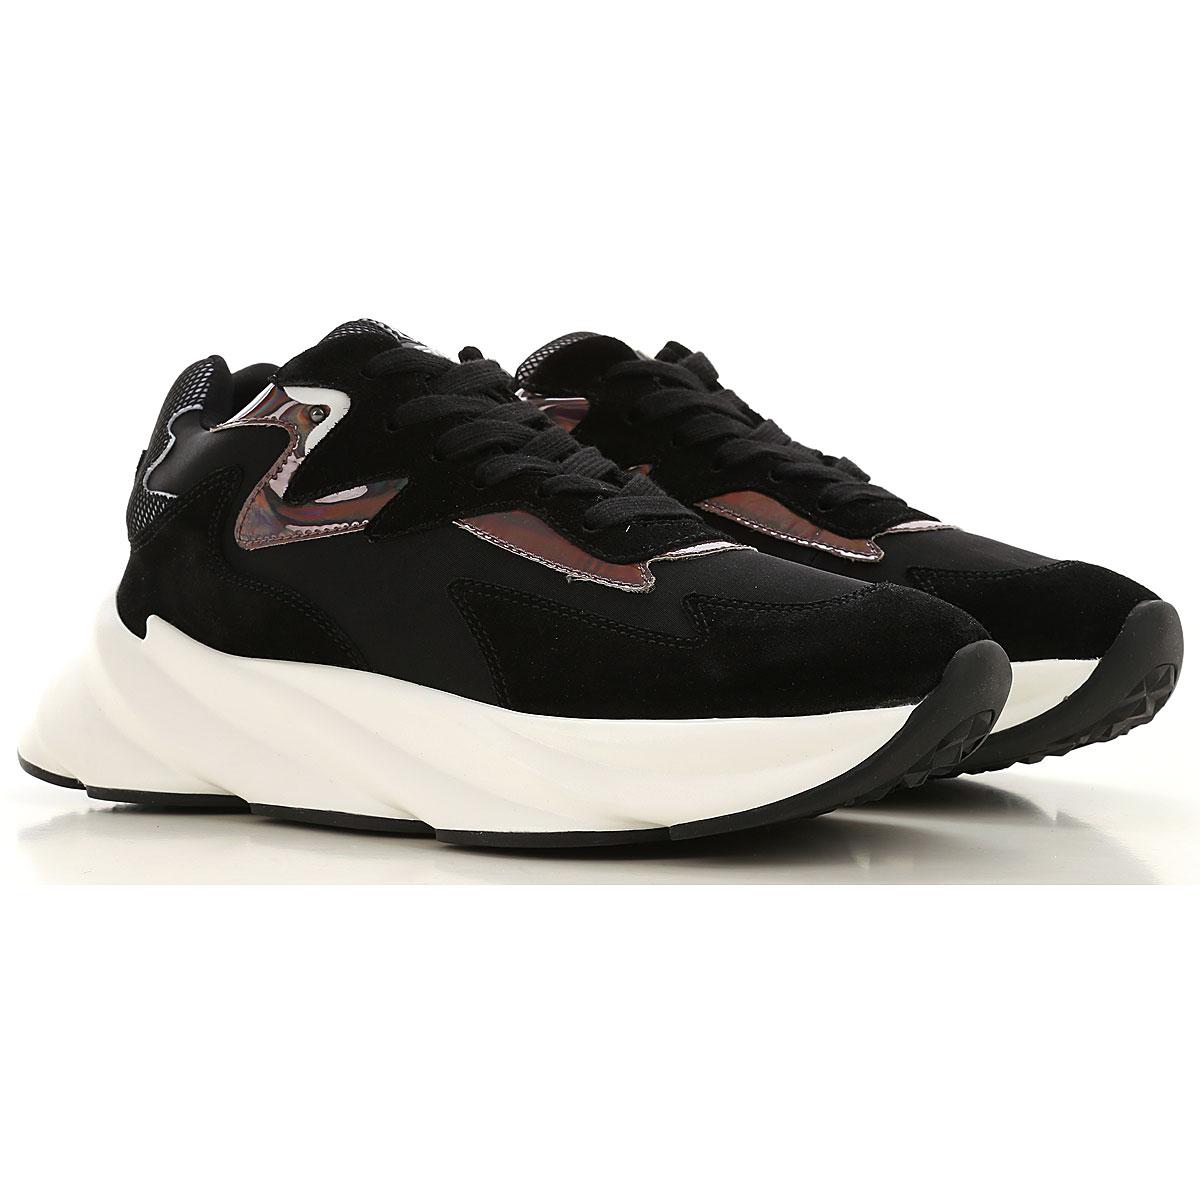 Elena Iachi Sneakers for Women On Sale, Black, Leather, 2019, 10 7 8 9